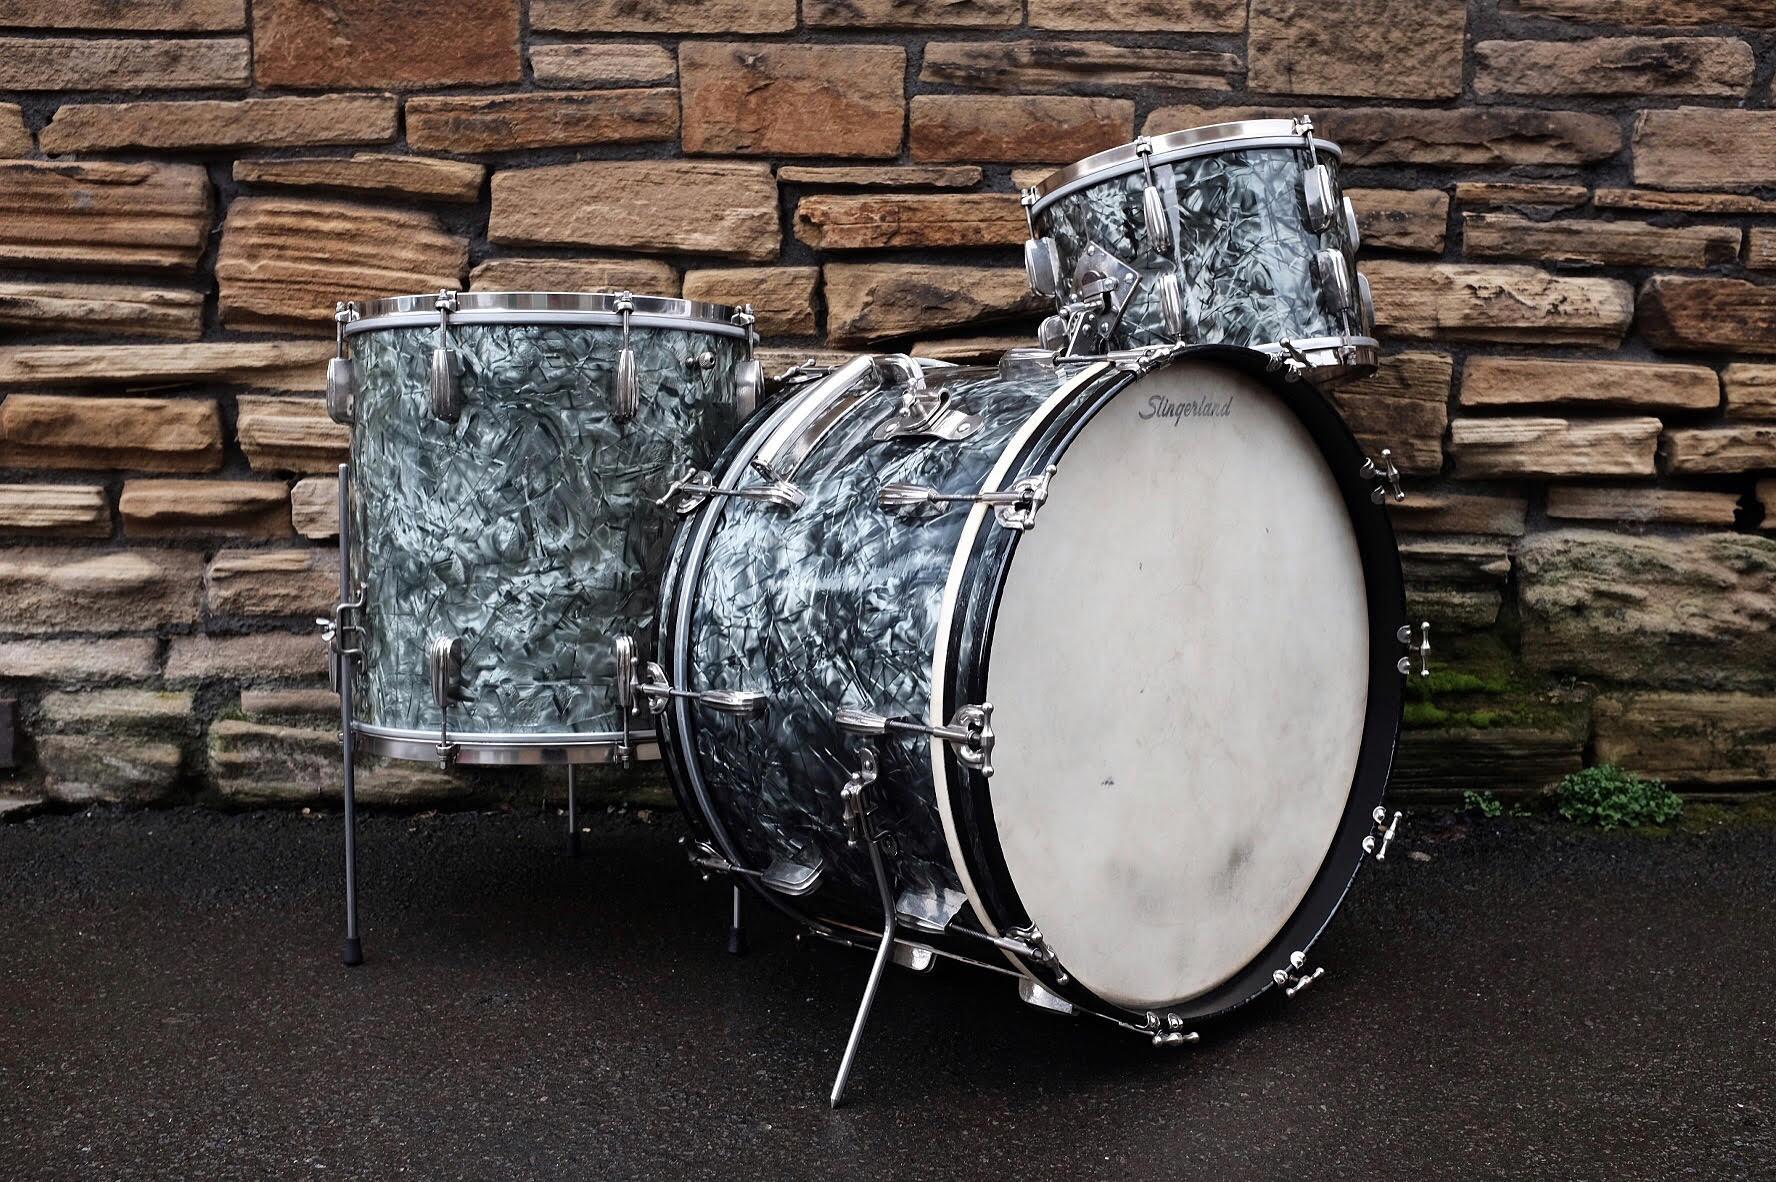 "Circa 1955 Slingerland 'Gene Krupa Deluxe' Radio King, sized 22"", 13"", 16"" in original black diamond pearl. Restored and sold in January/February 2017."